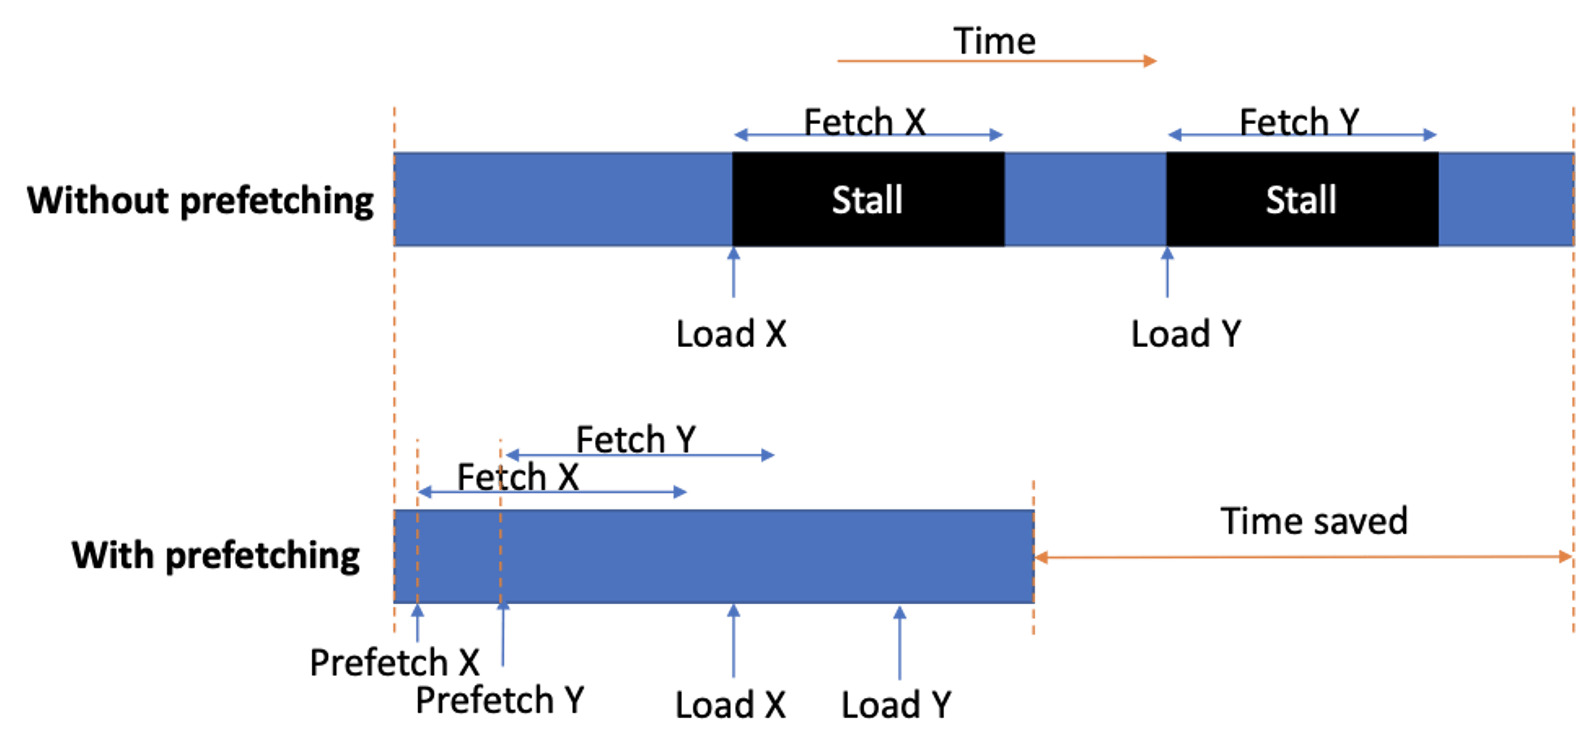 https://community.arm.com/developer/research/b/articles/posts/making-temporal-prefetchers-practical--the-misb-prefetcher